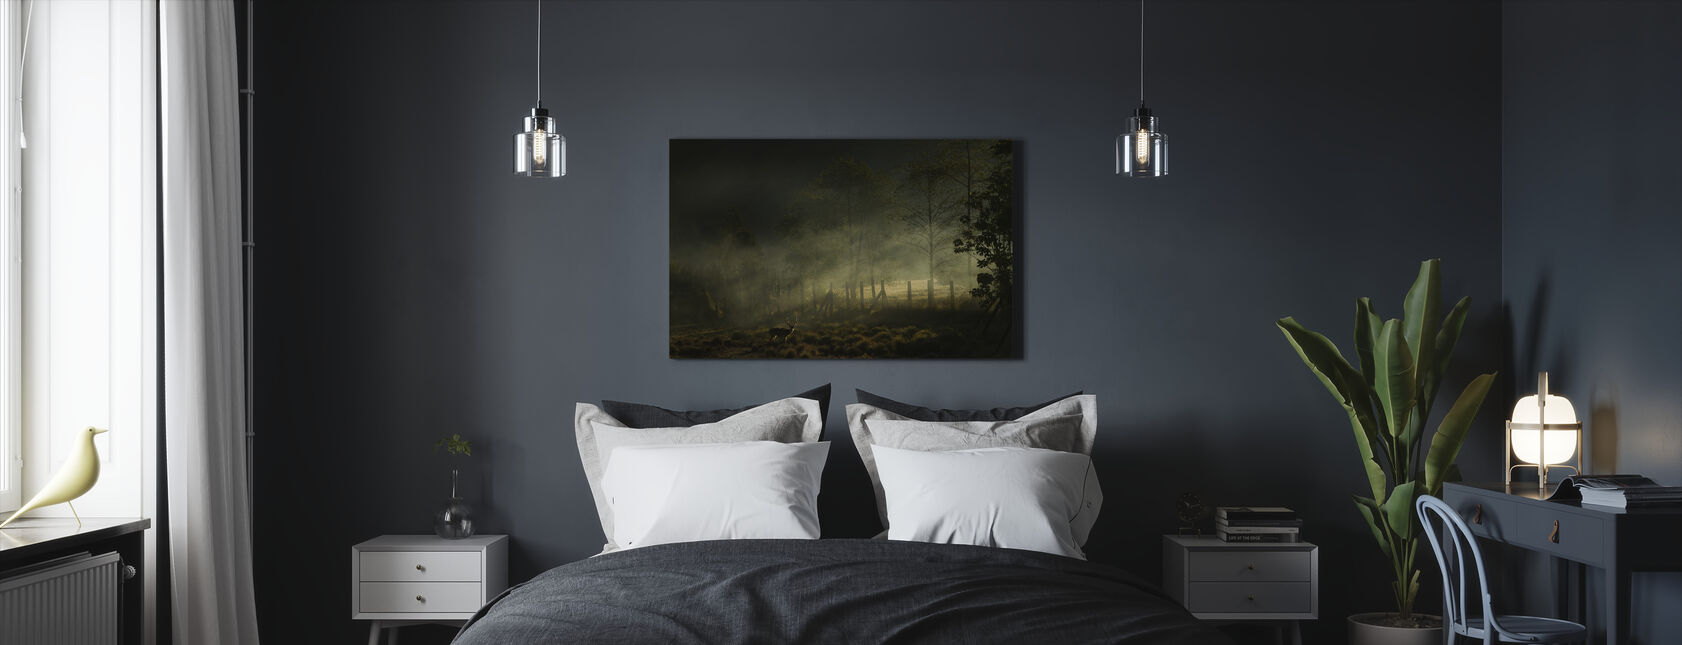 Misty ochtend - Canvas print - Slaapkamer